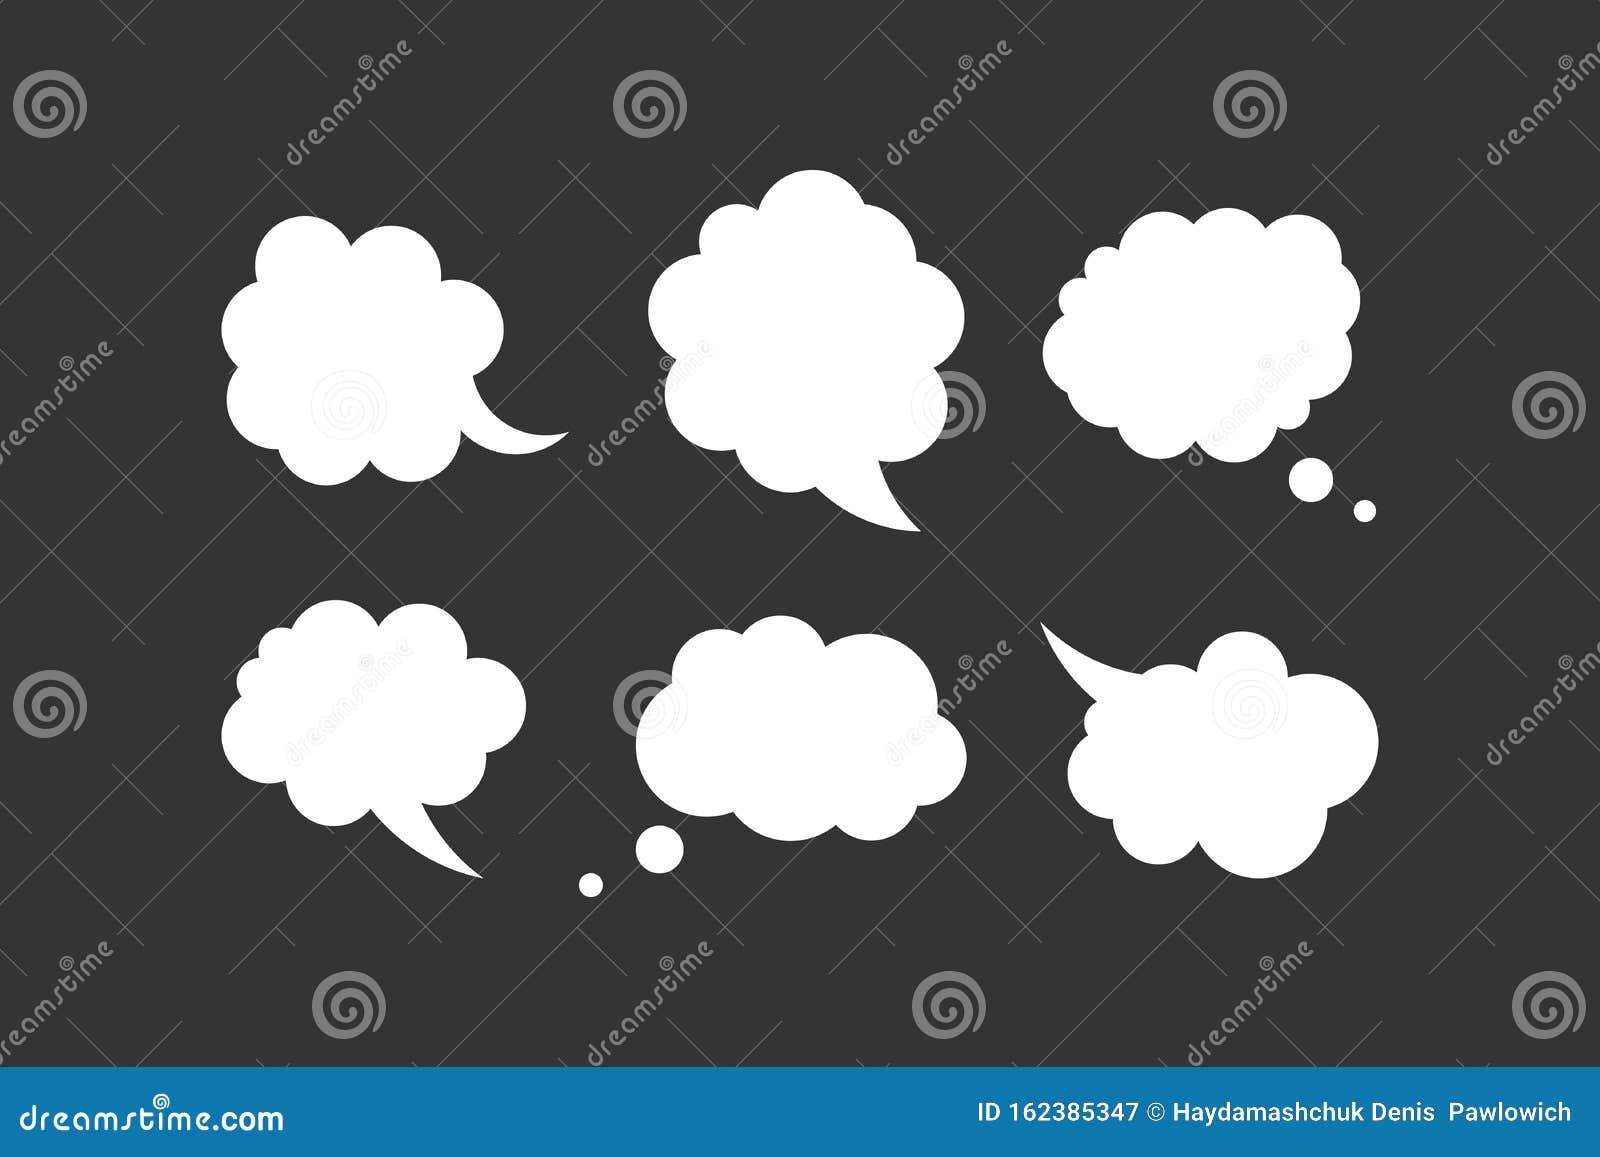 Blank Empty Speech Bubble Collection Vector. Stickers of Speak ...